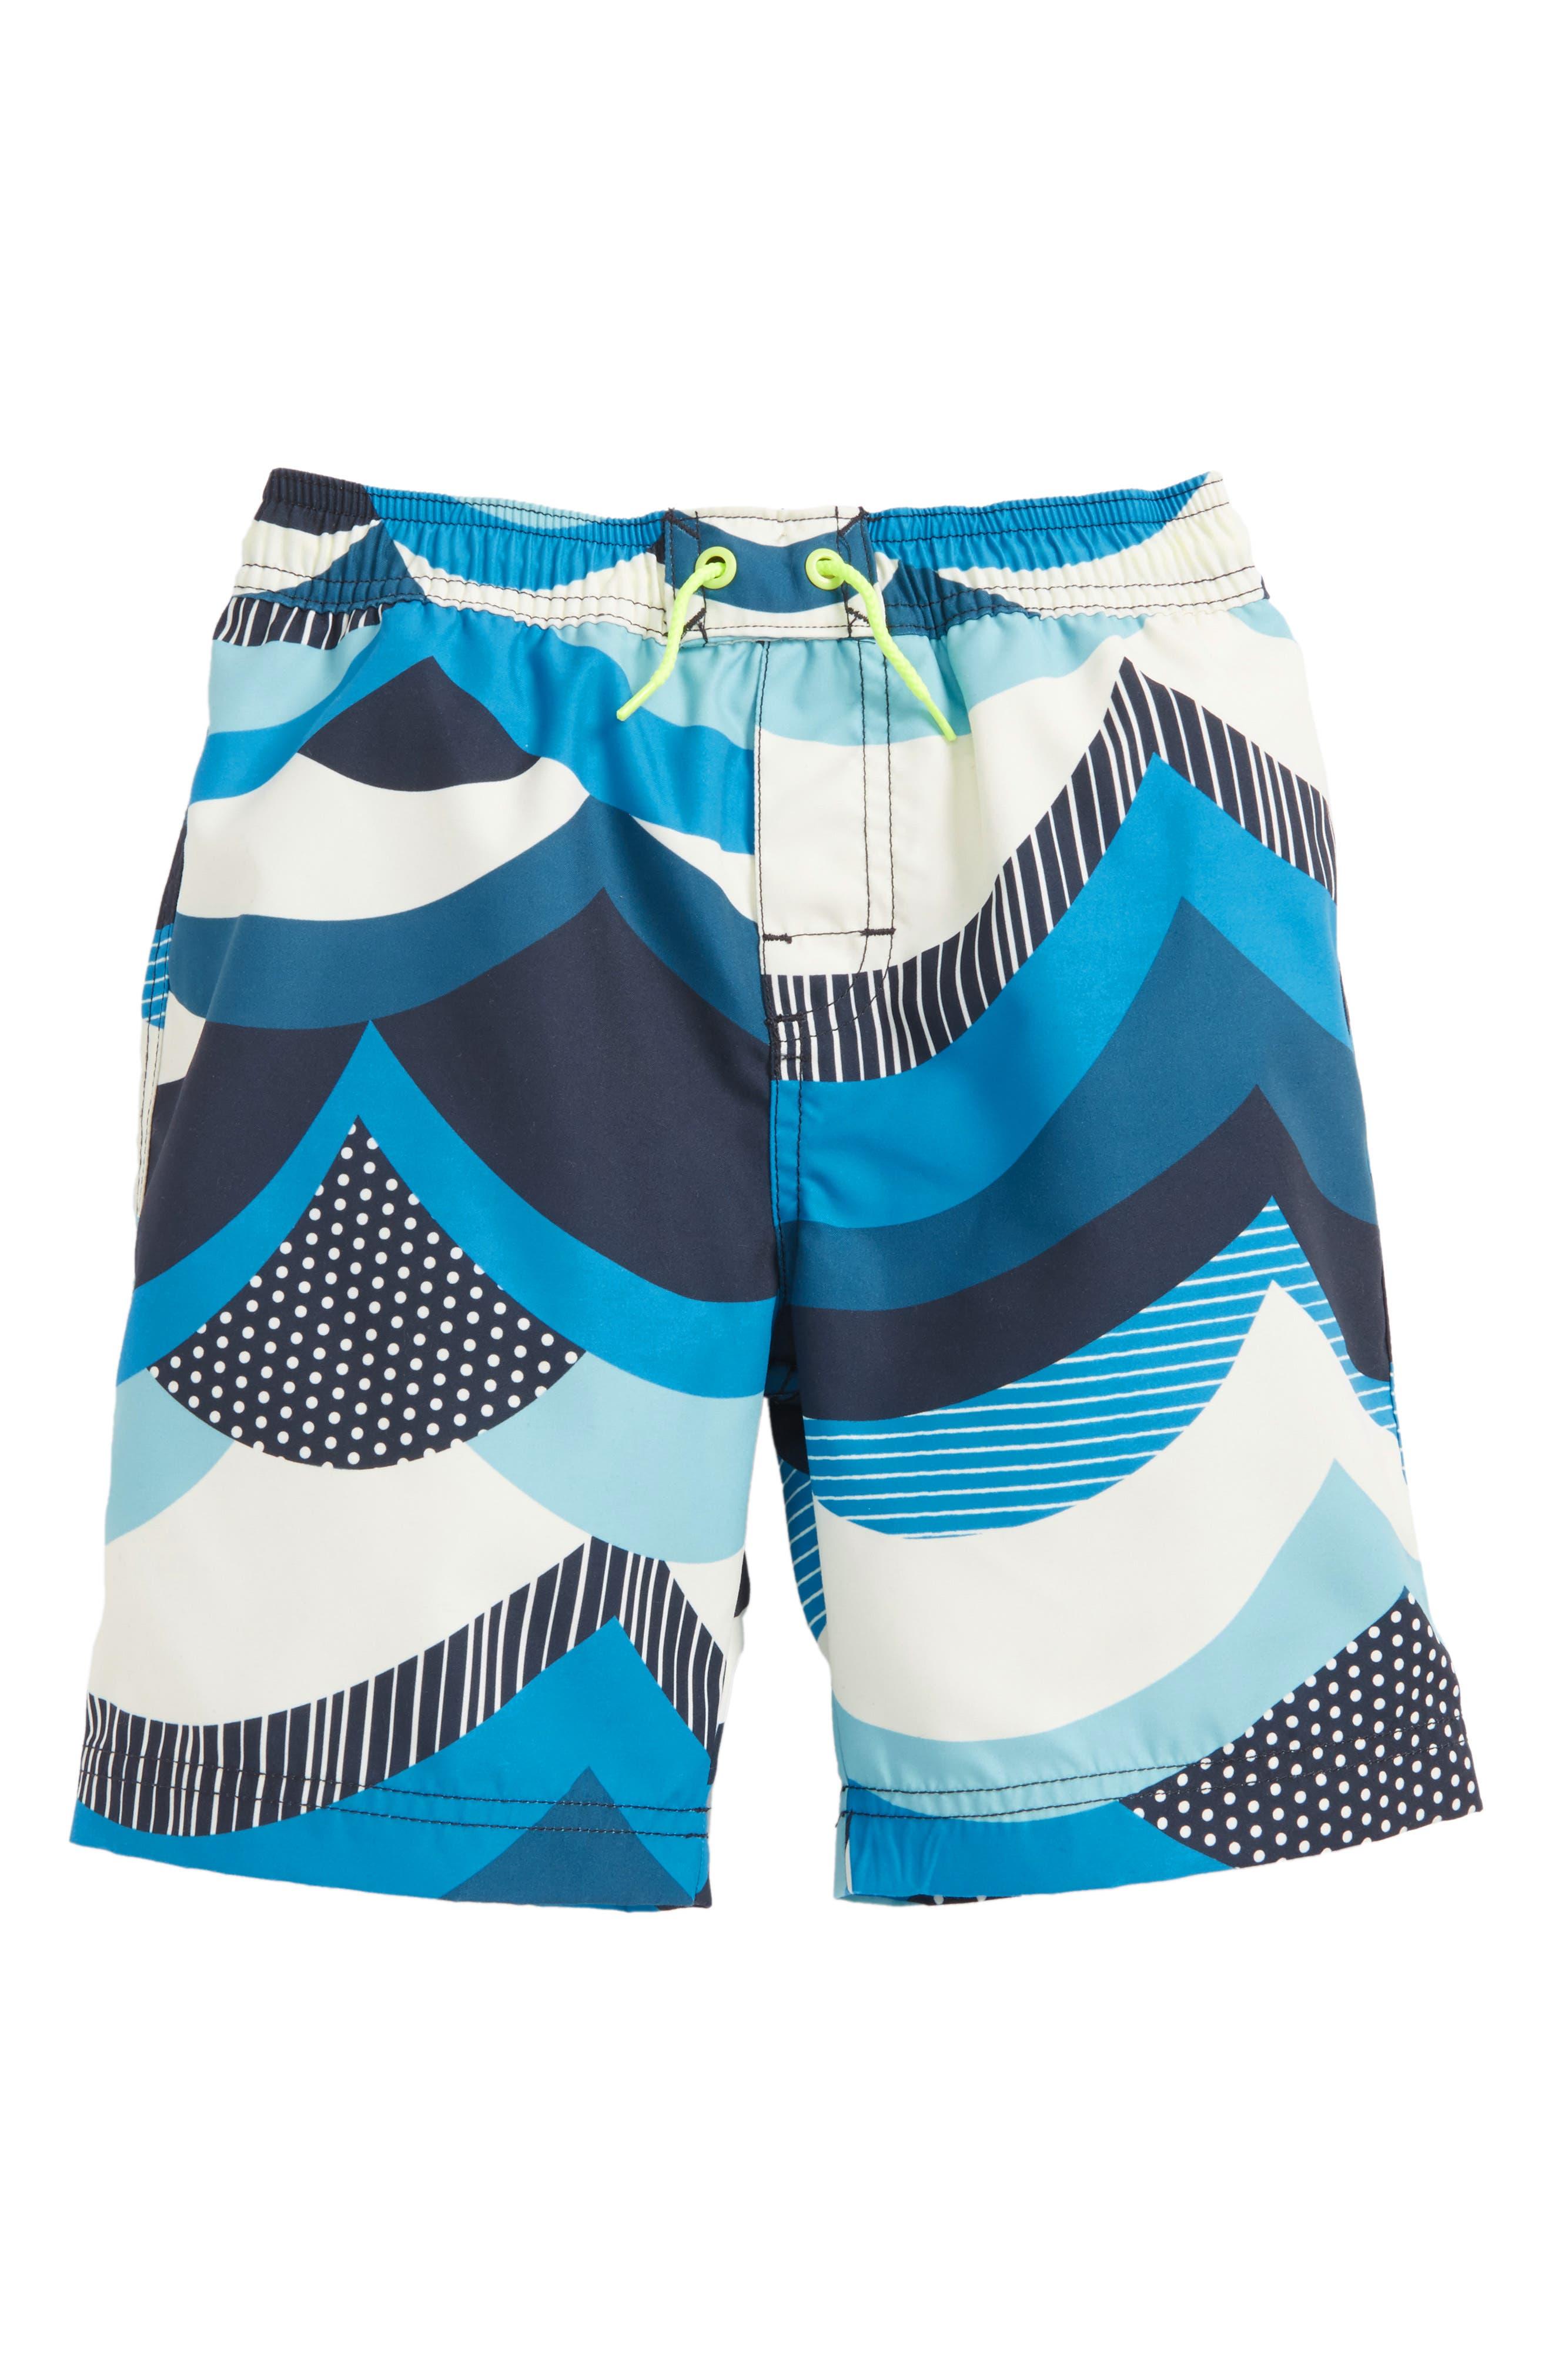 Make Waves Swim Trunks,                         Main,                         color, 411